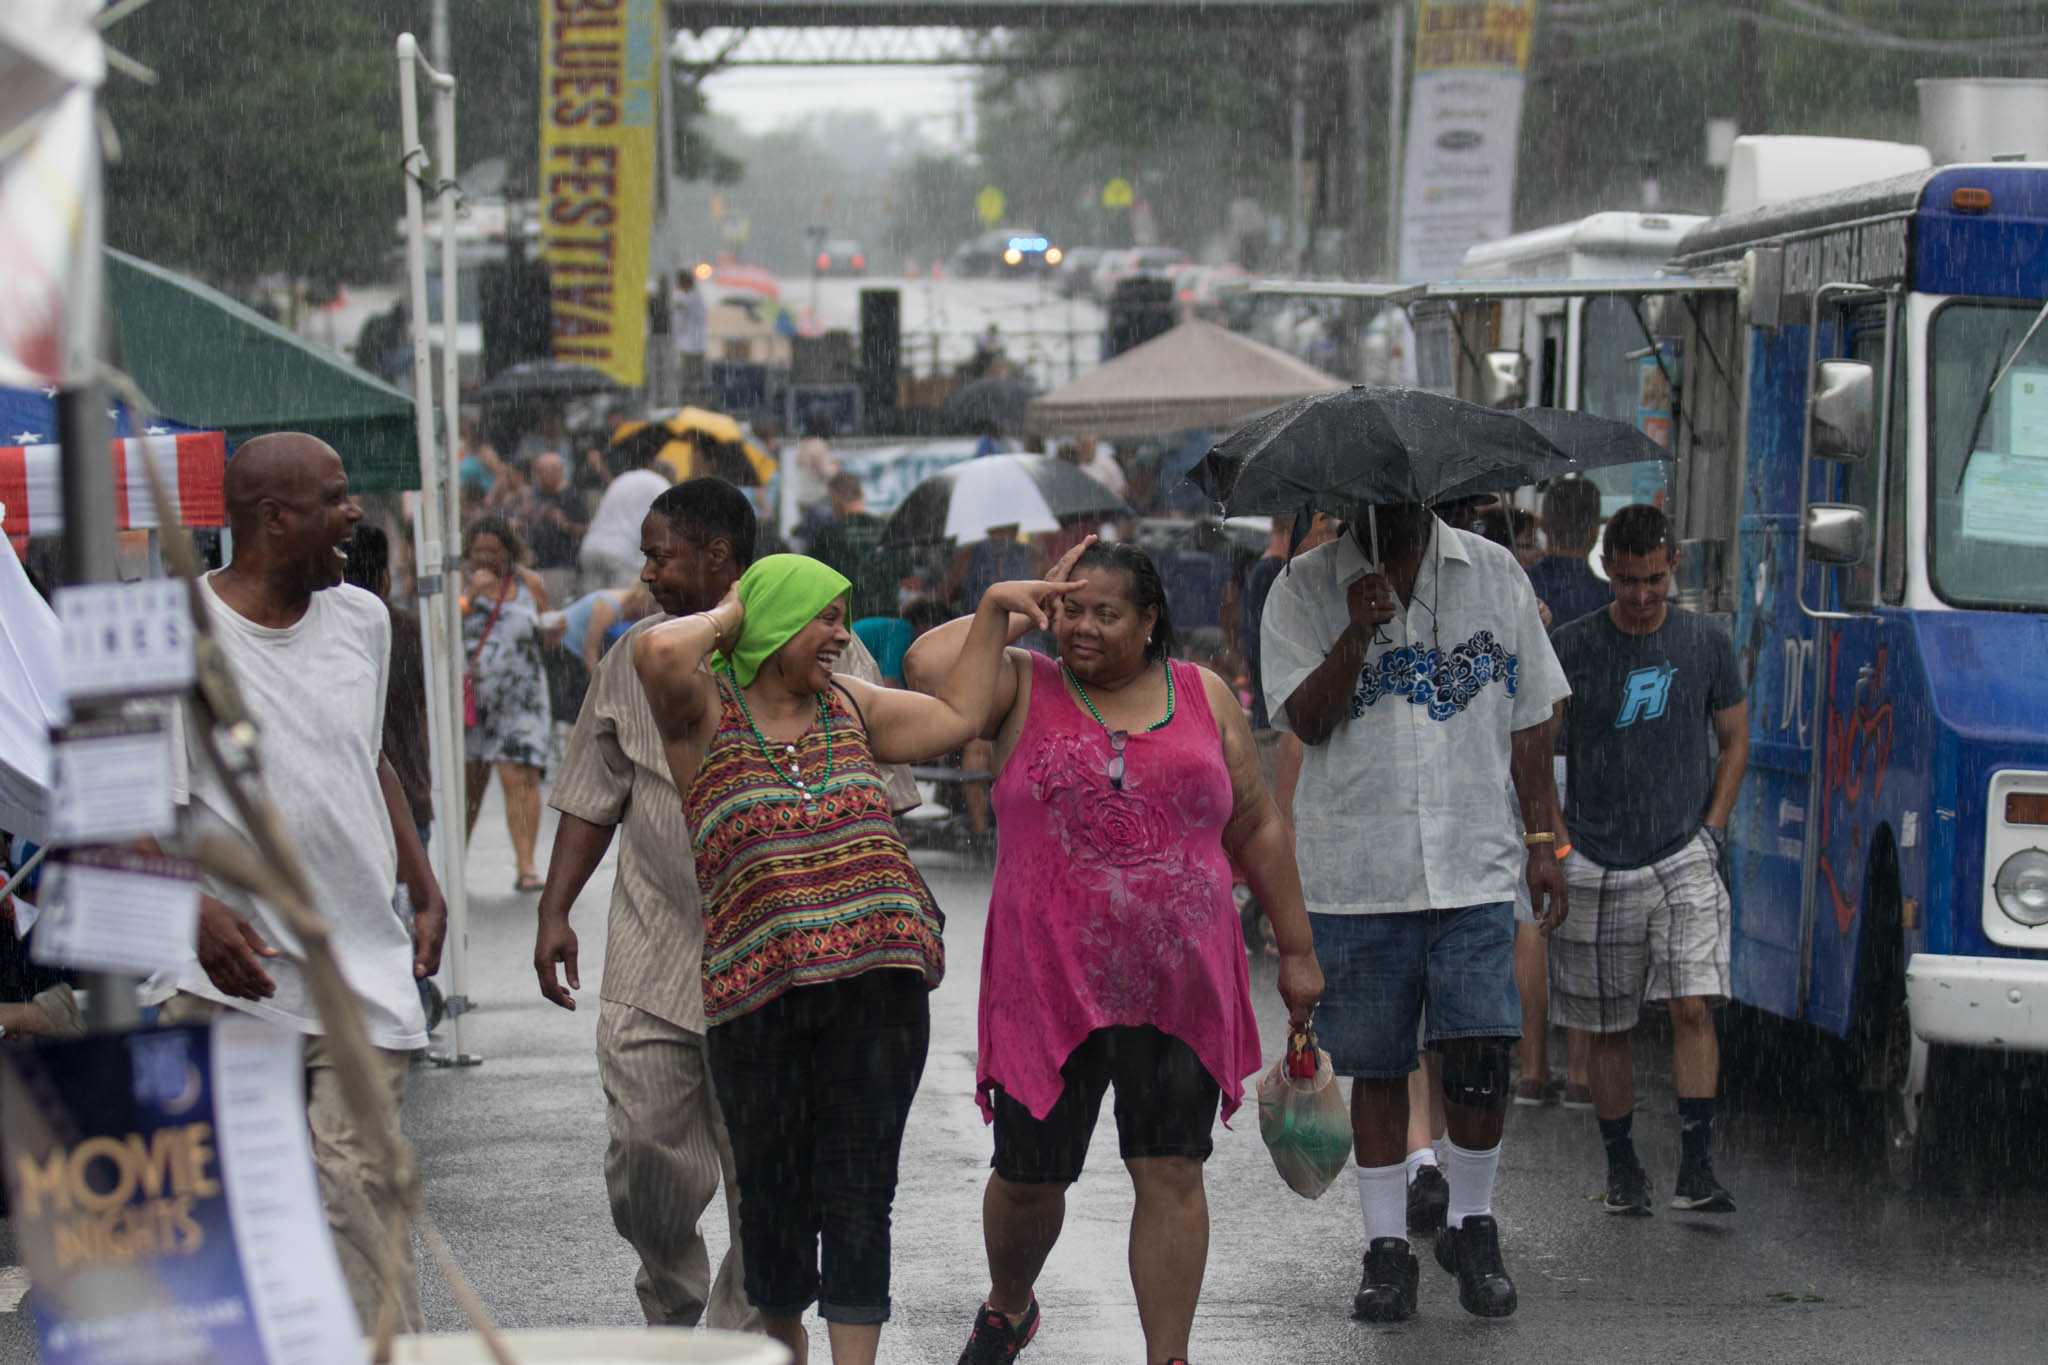 columbia pike blues festival 2015-56.jpg